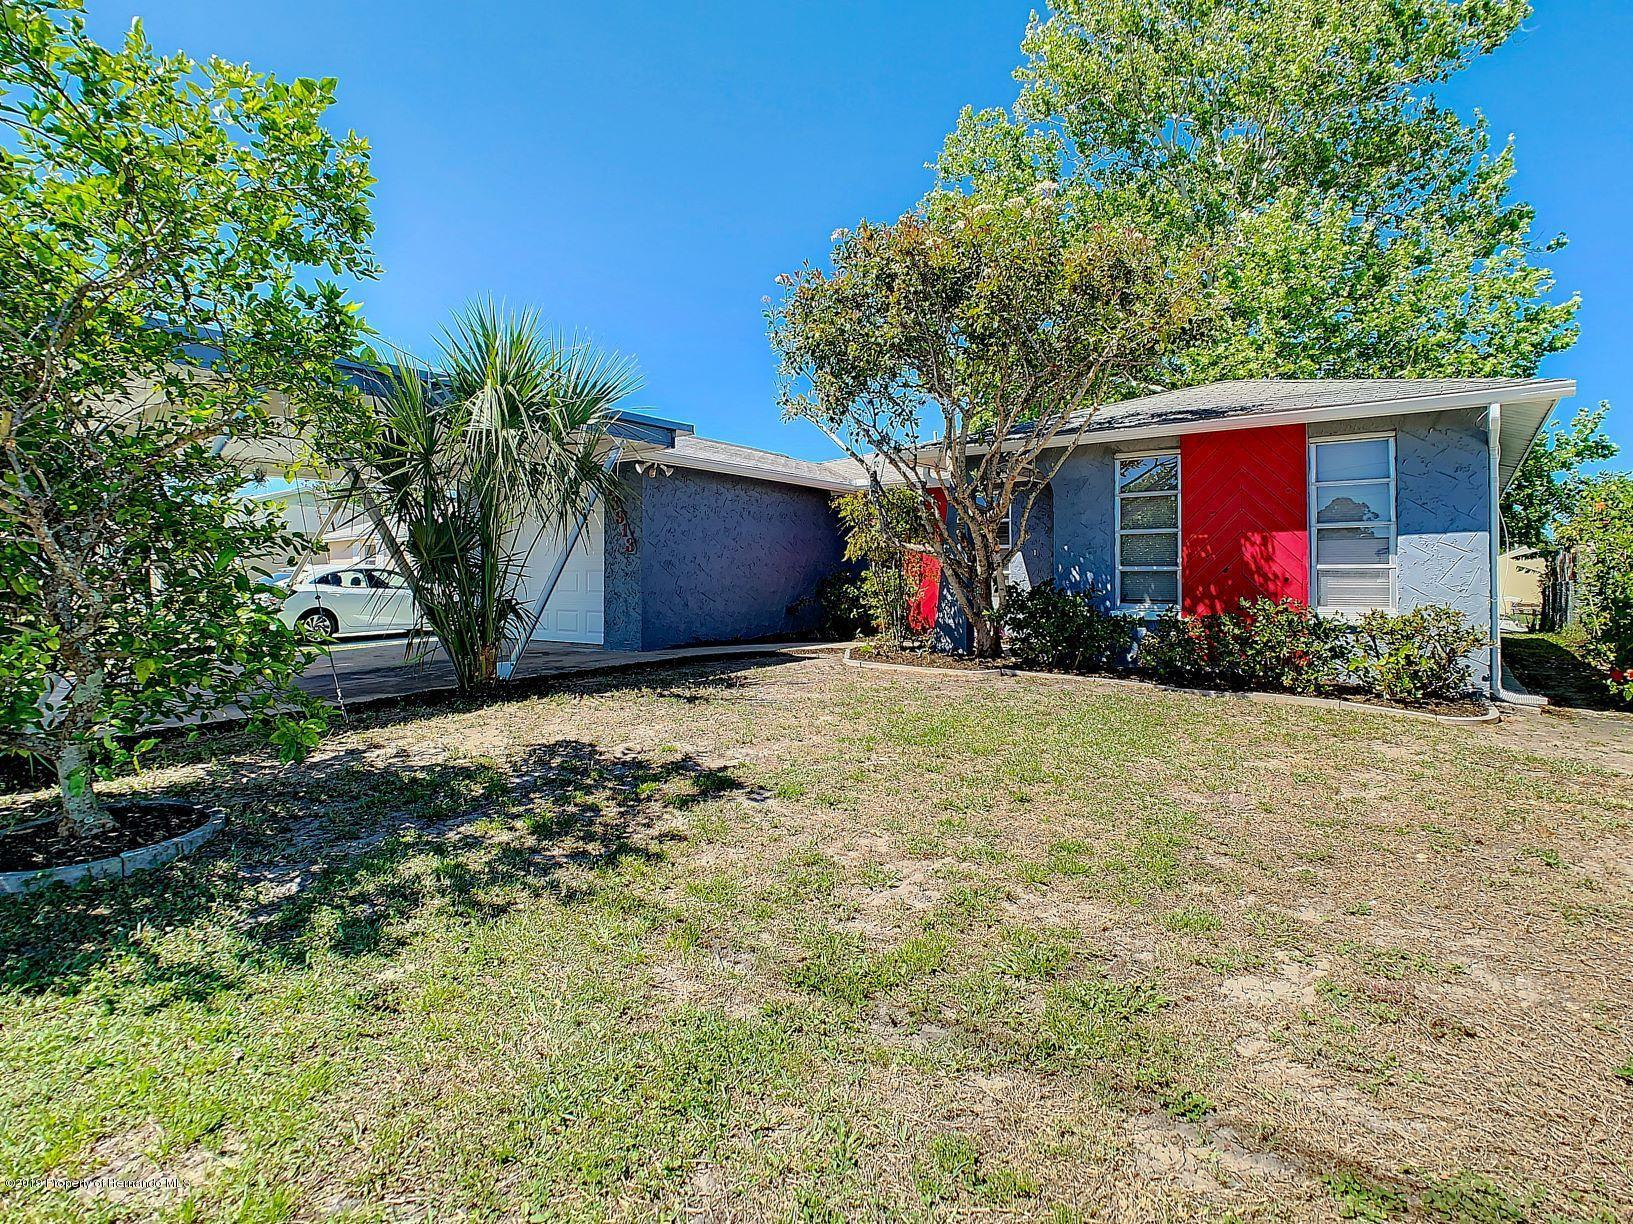 13913 Muriel Avenue, Hudson, Florida 34667, 3 Bedrooms Bedrooms, ,2 BathroomsBathrooms,Residential,For Sale,Muriel,2200568